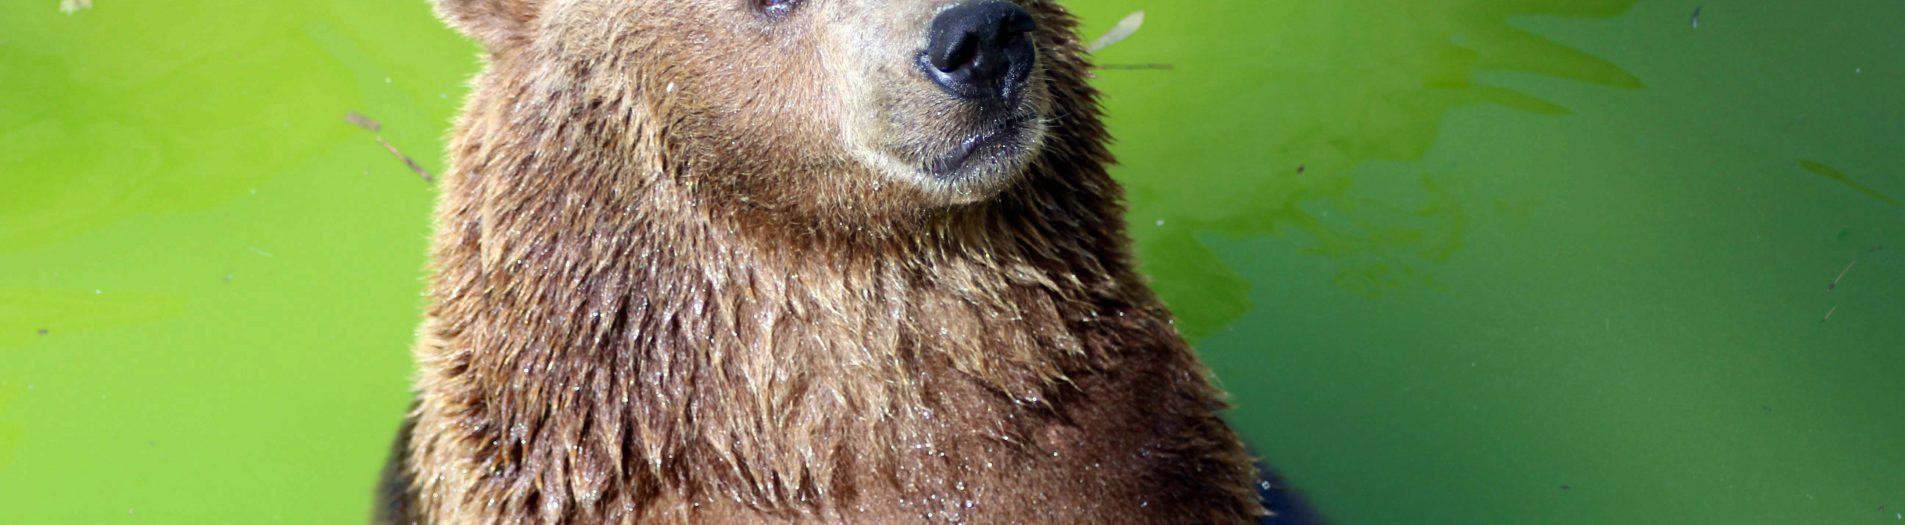 Le zoo du Belvédère حديقة البلفيدير